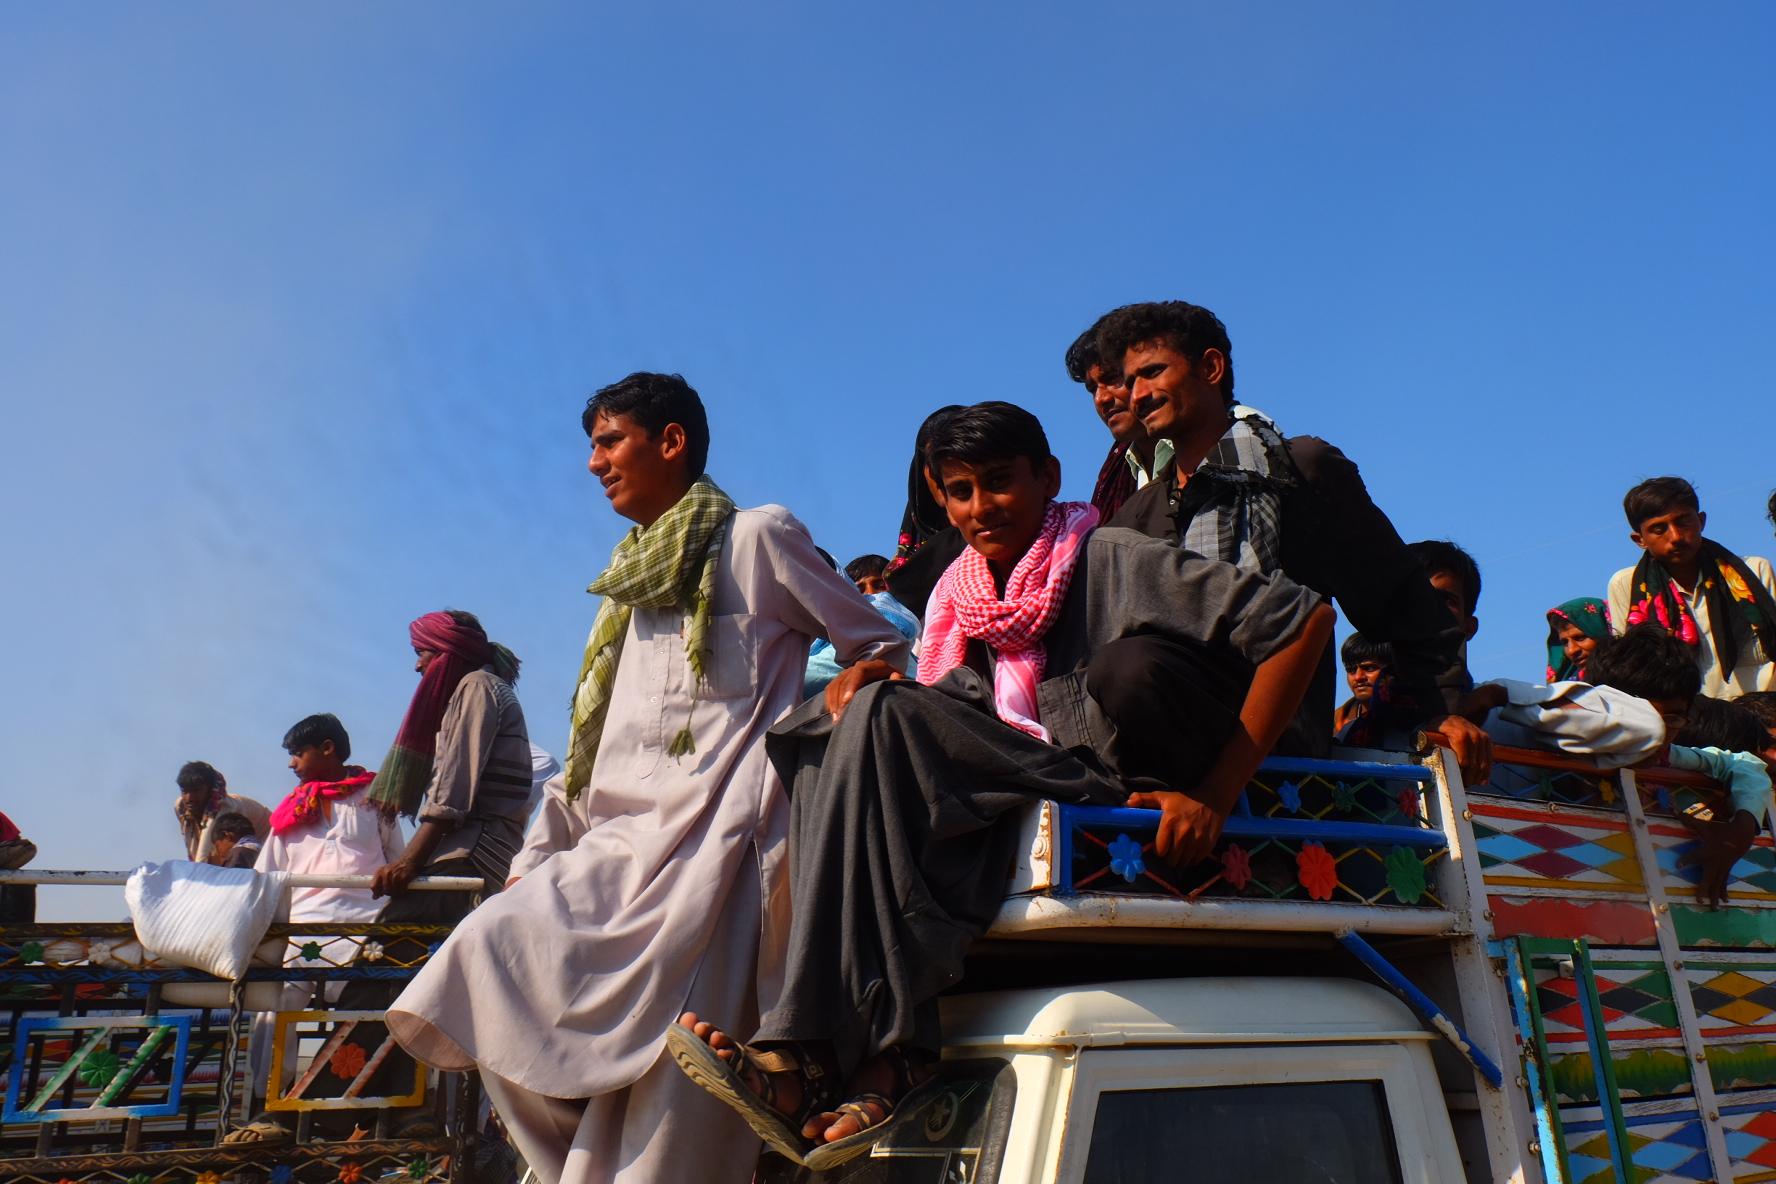 Crowds gather to watch <em>bakhmallakhado</em> wrestling. Credit: Gaurav Madan